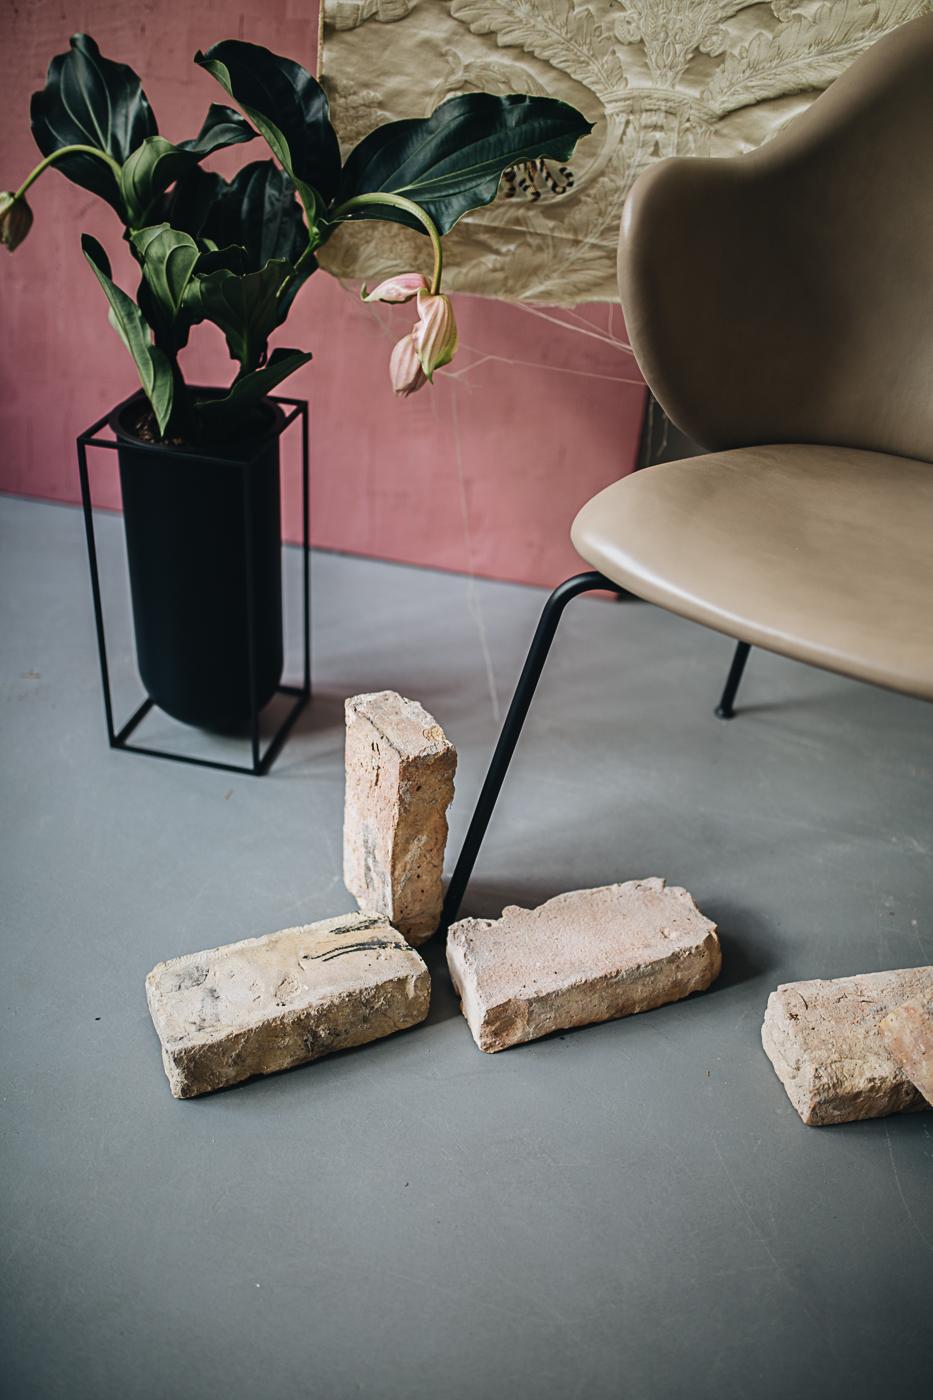 Setz Dich! - Lassen Chair.